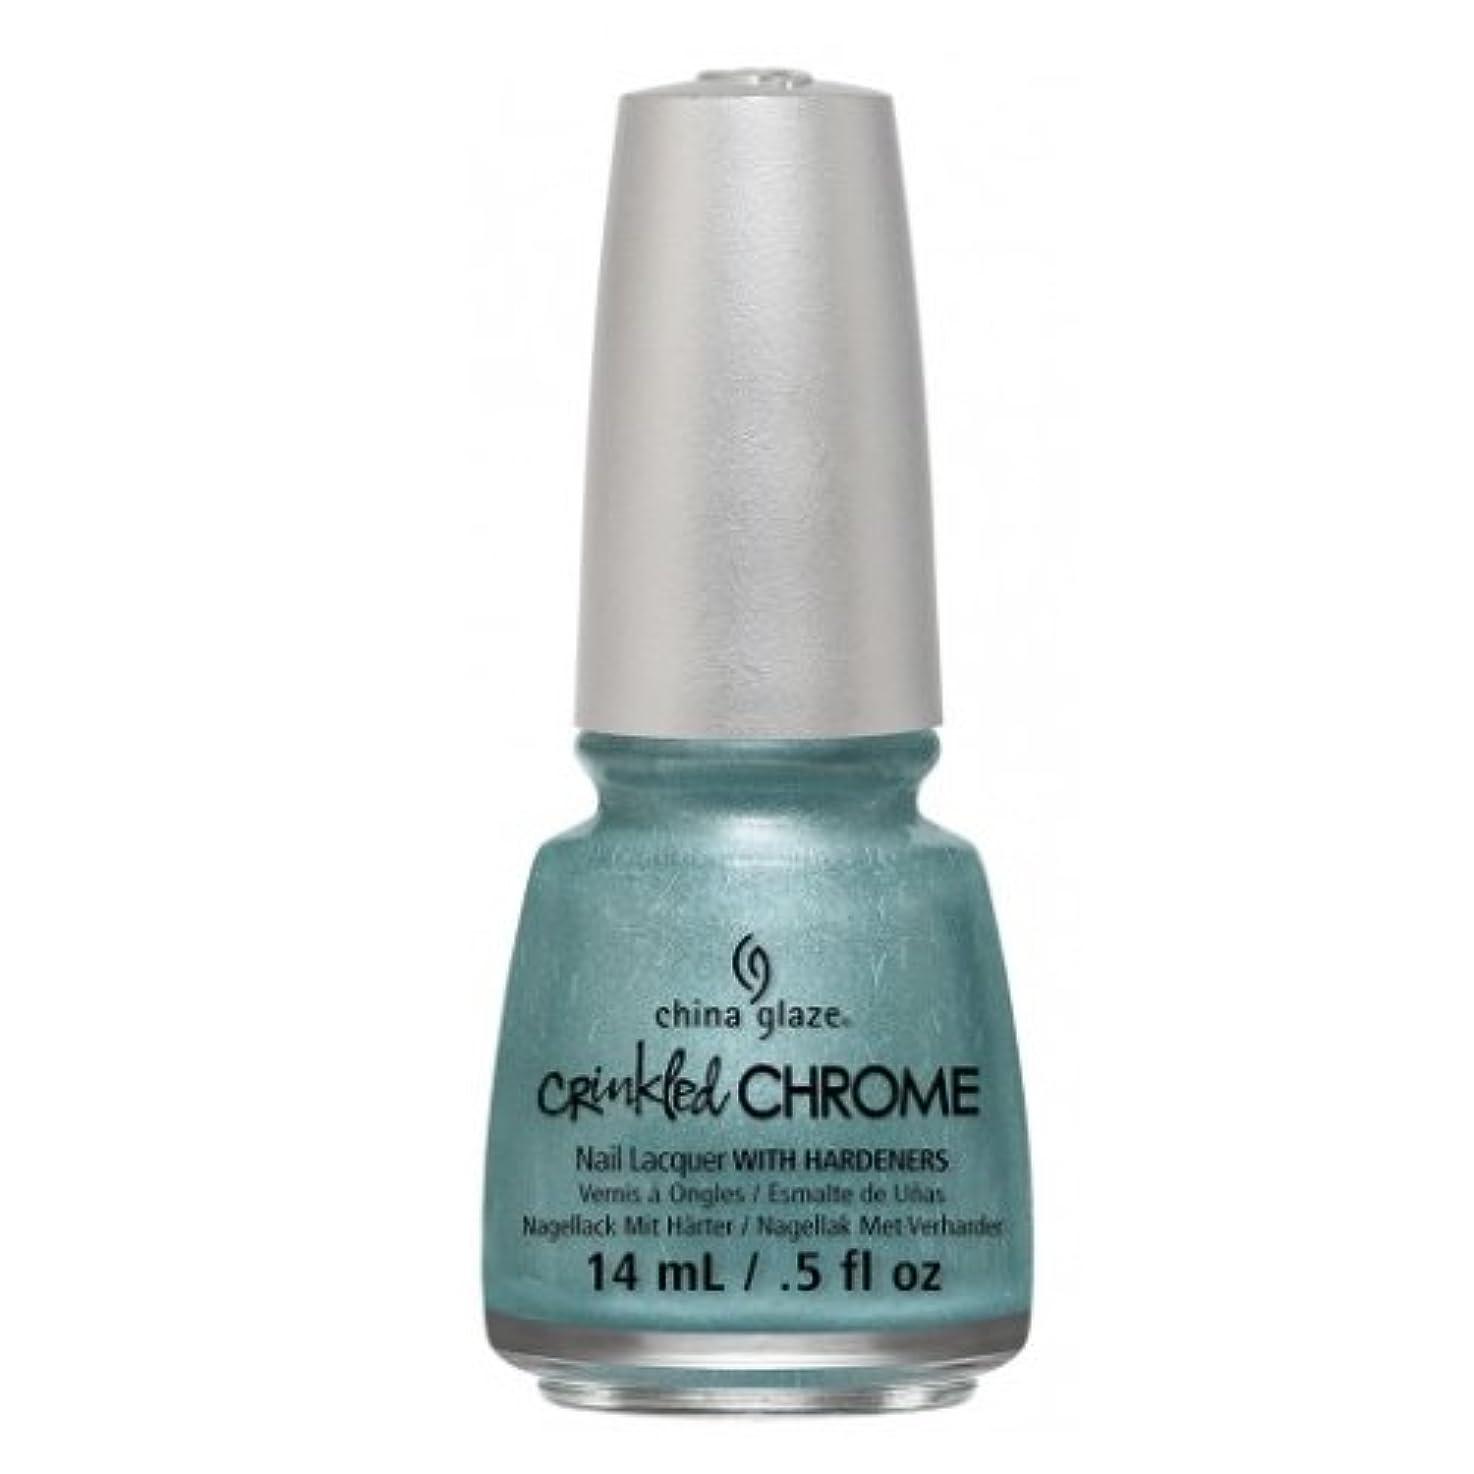 検出器仲人同性愛者(3 Pack) CHINA GLAZE Nail Lacquer - Crinkled Chrome - Don't Be Foiled (並行輸入品)